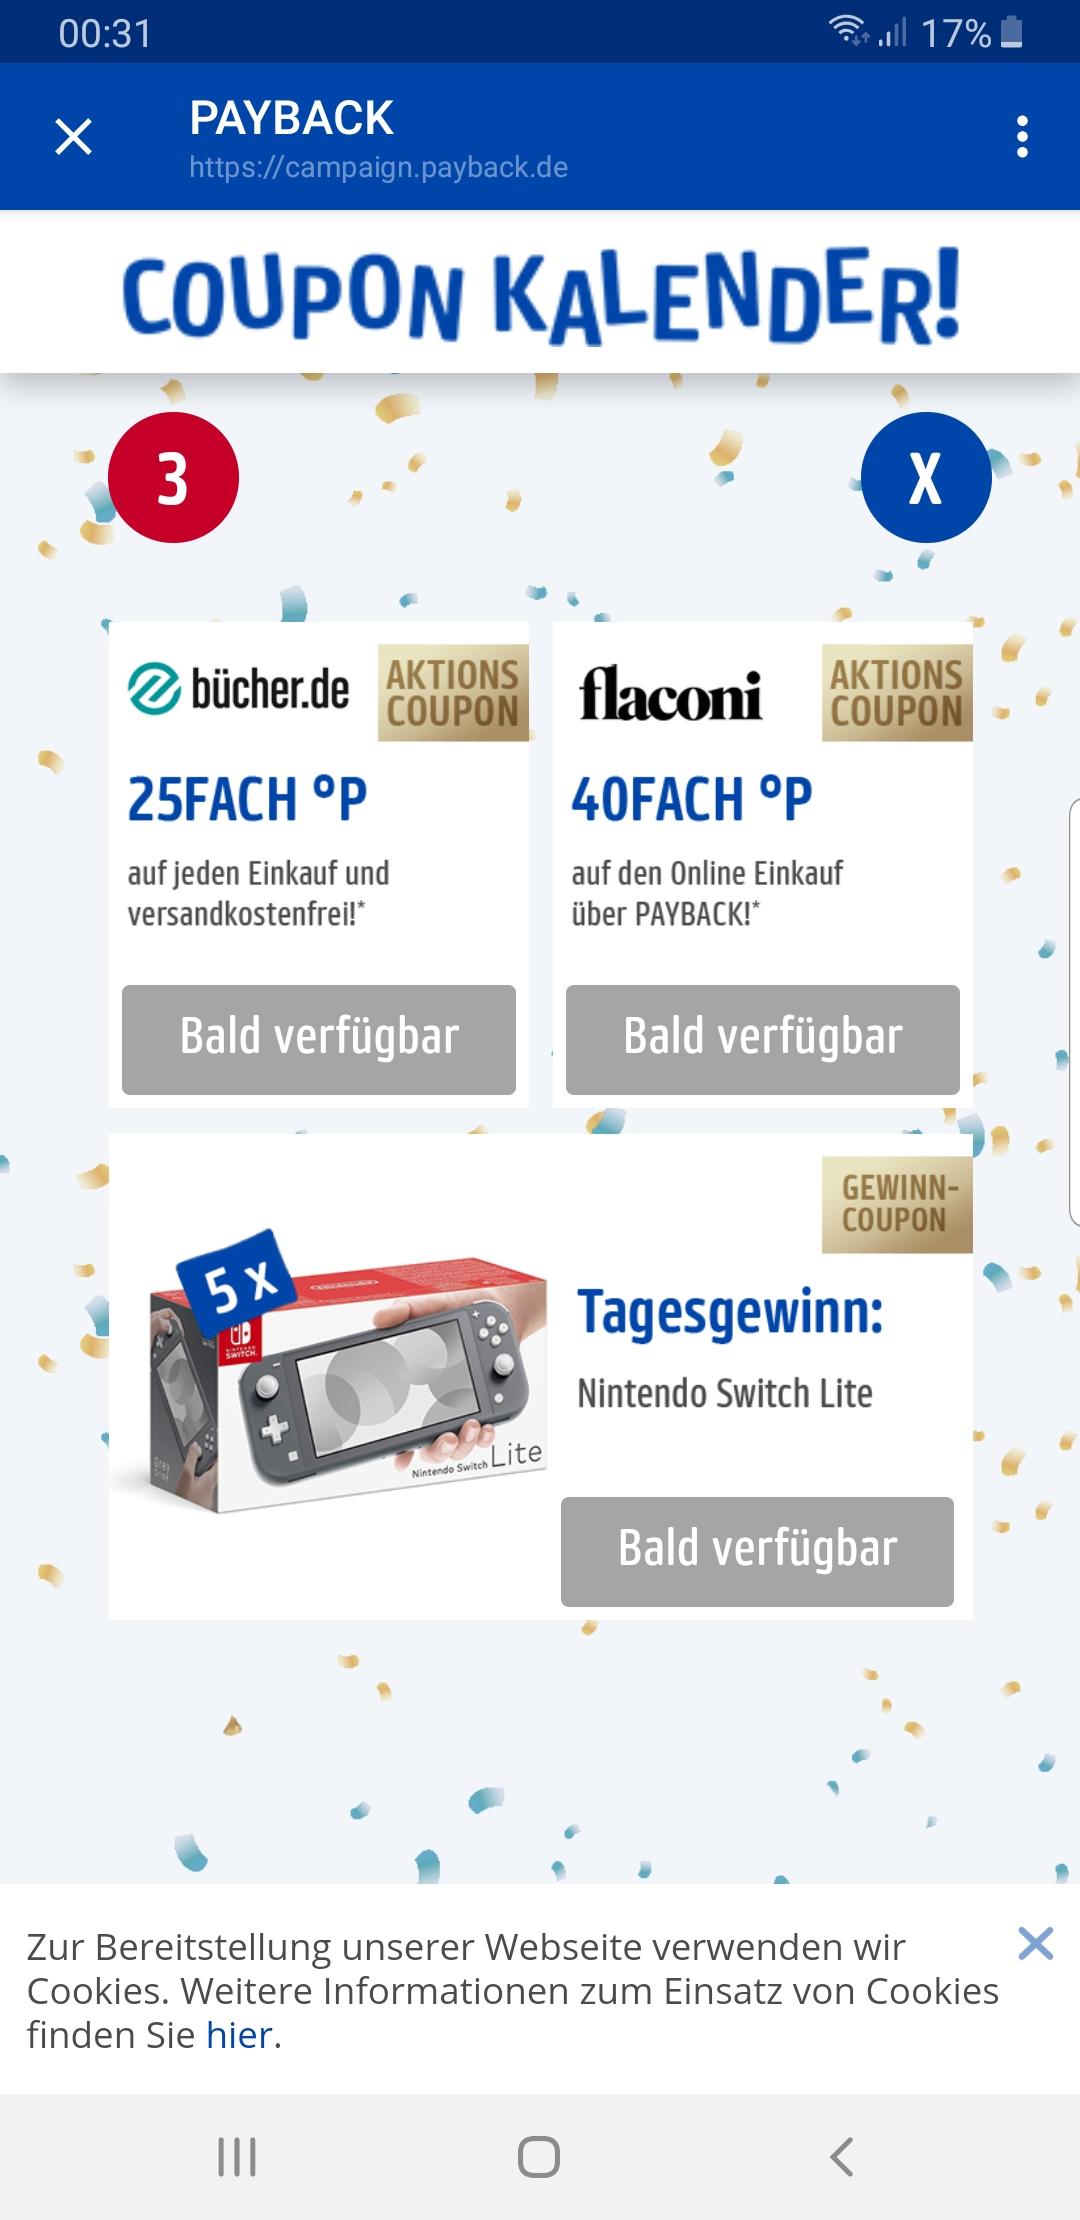 [Payback App] 40 Fach Punkte bei Flaconi